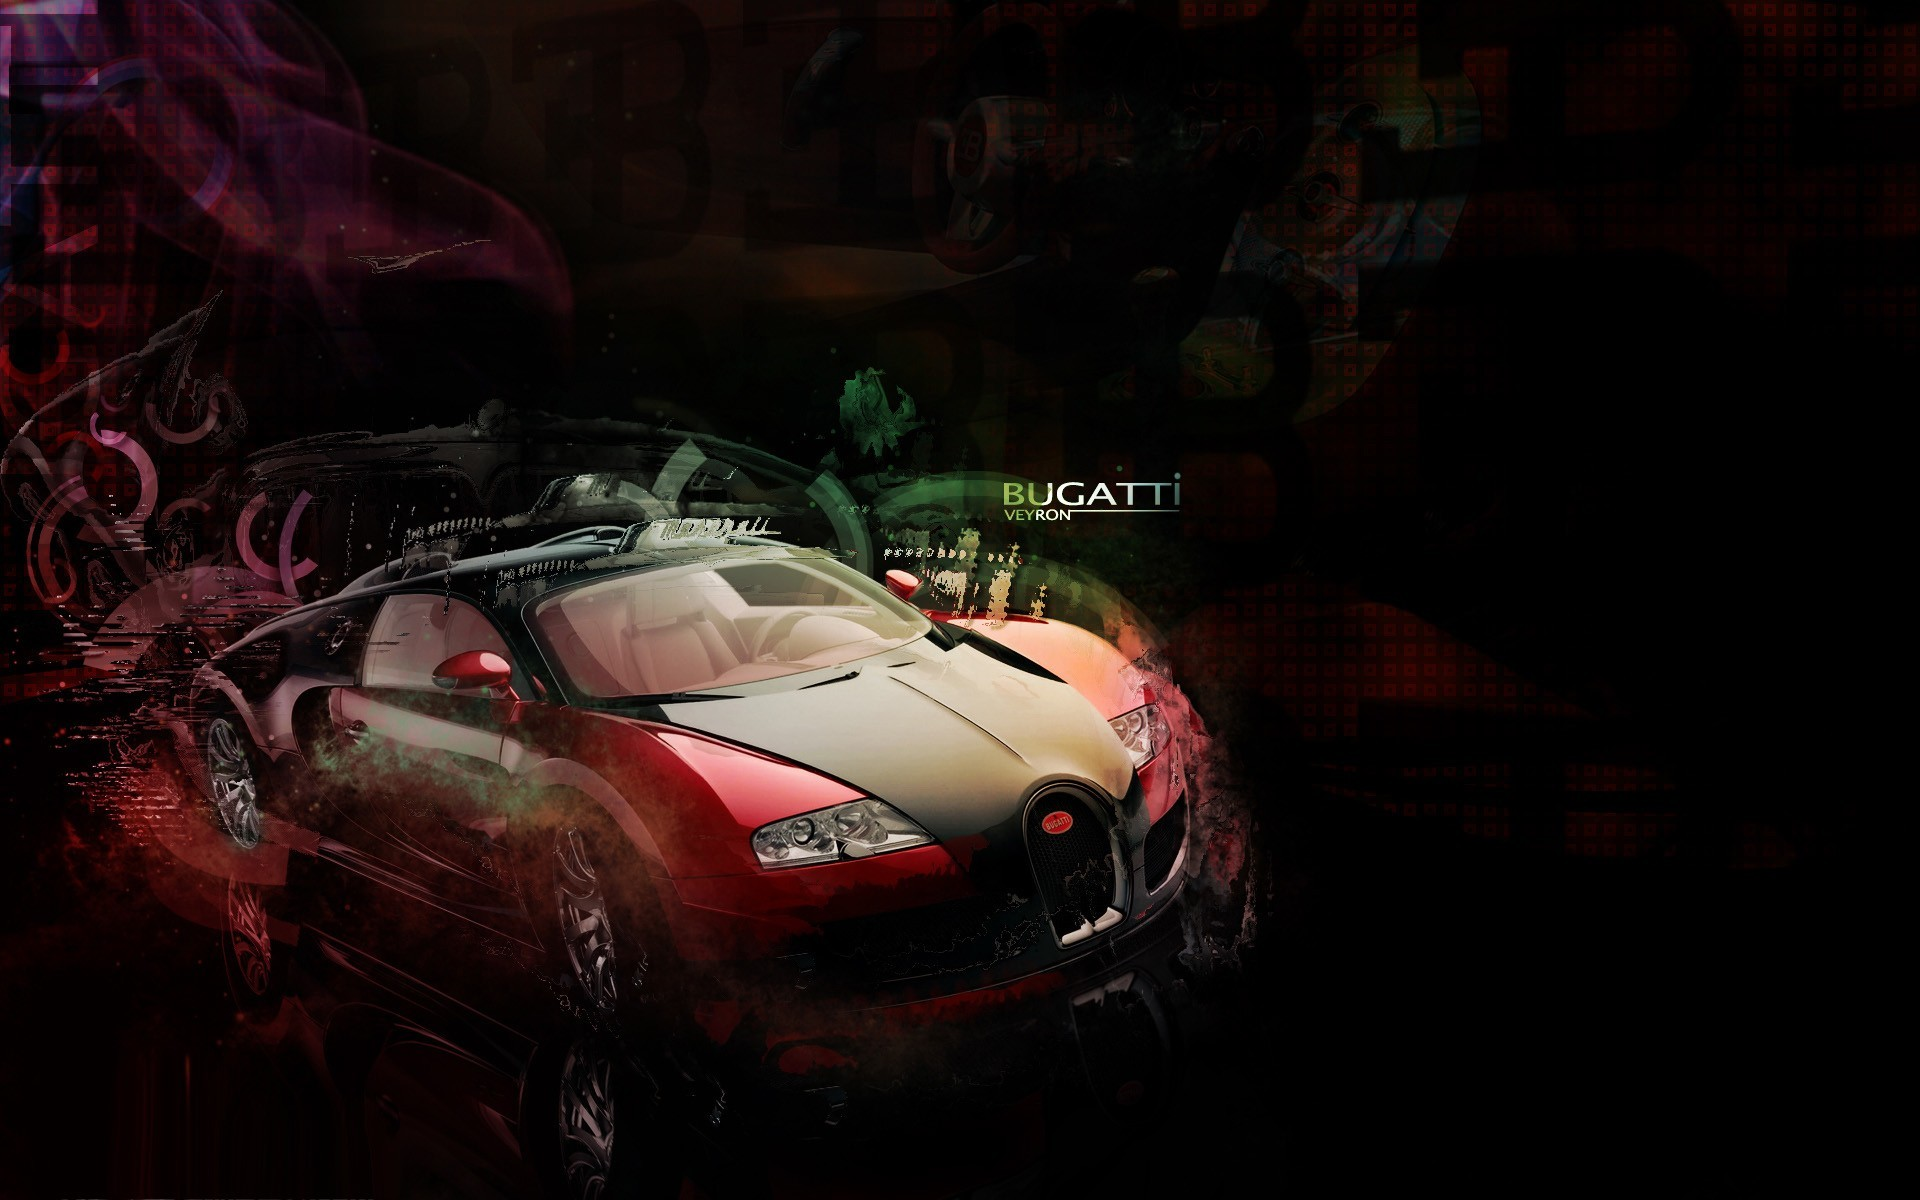 Hd Wallpaper Wallpapers And Bugatti On Pinterest